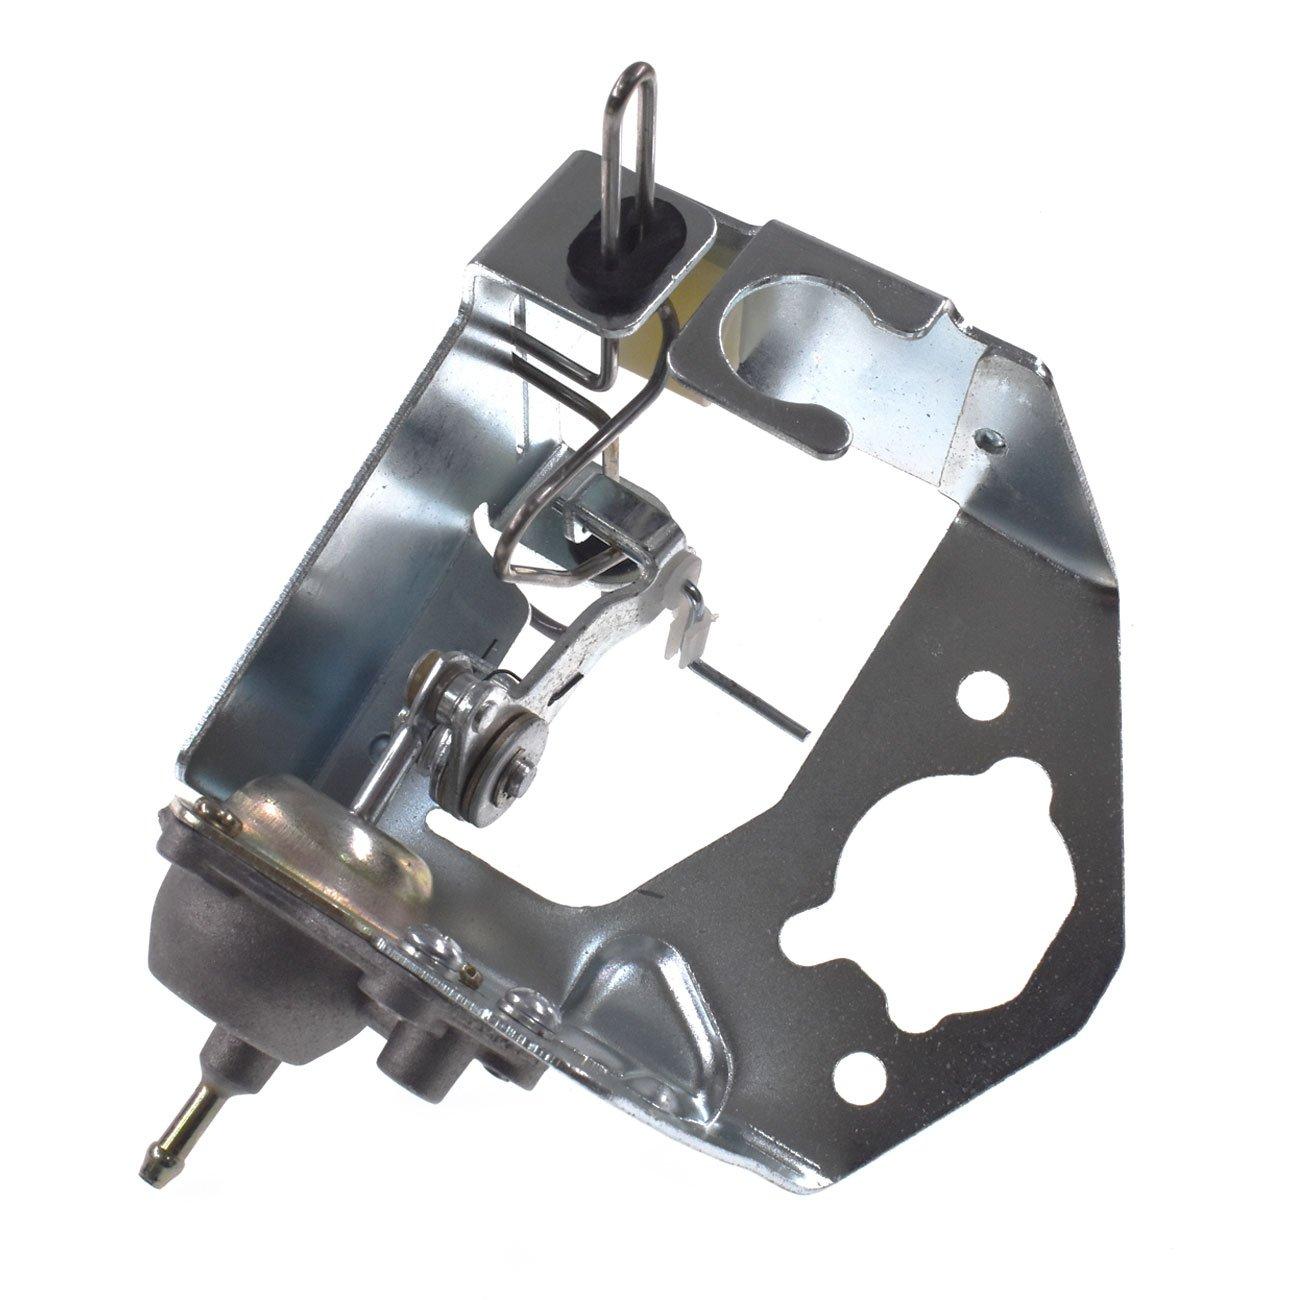 Supermotorparts Manual Choke Assembly fit Honda GX240 GX270 GX340 GX390 5KW-6.5KW Generator New